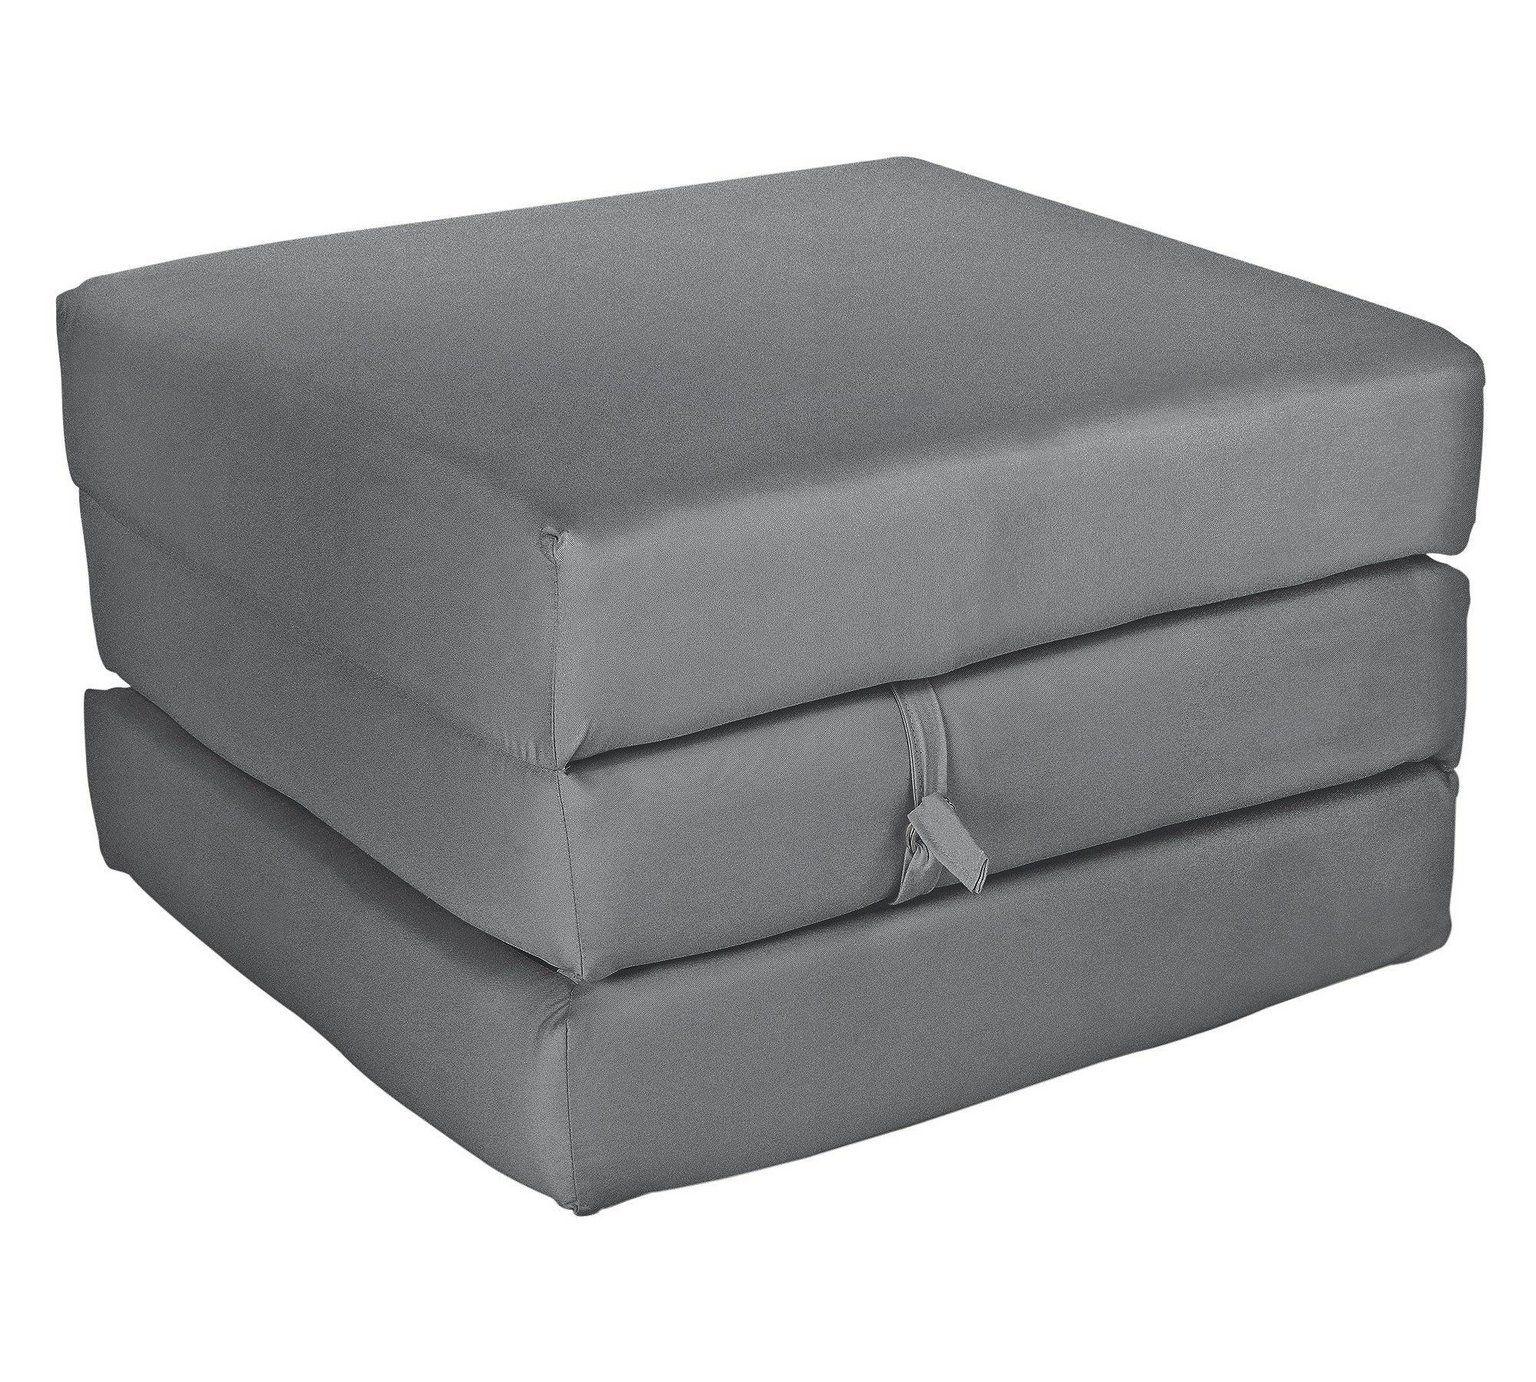 Buy Argos Home Single Mattress Cube Flint Grey Sofa